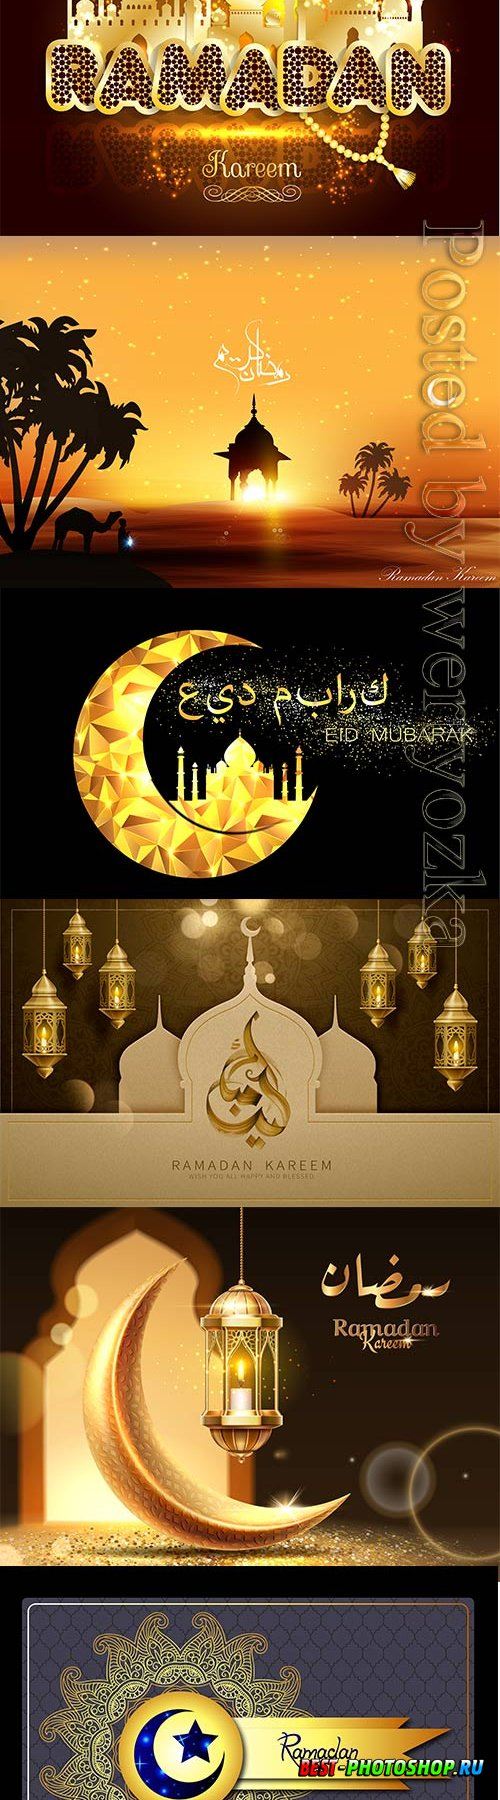 Ramadan kareem, eid mubarak vector illustration